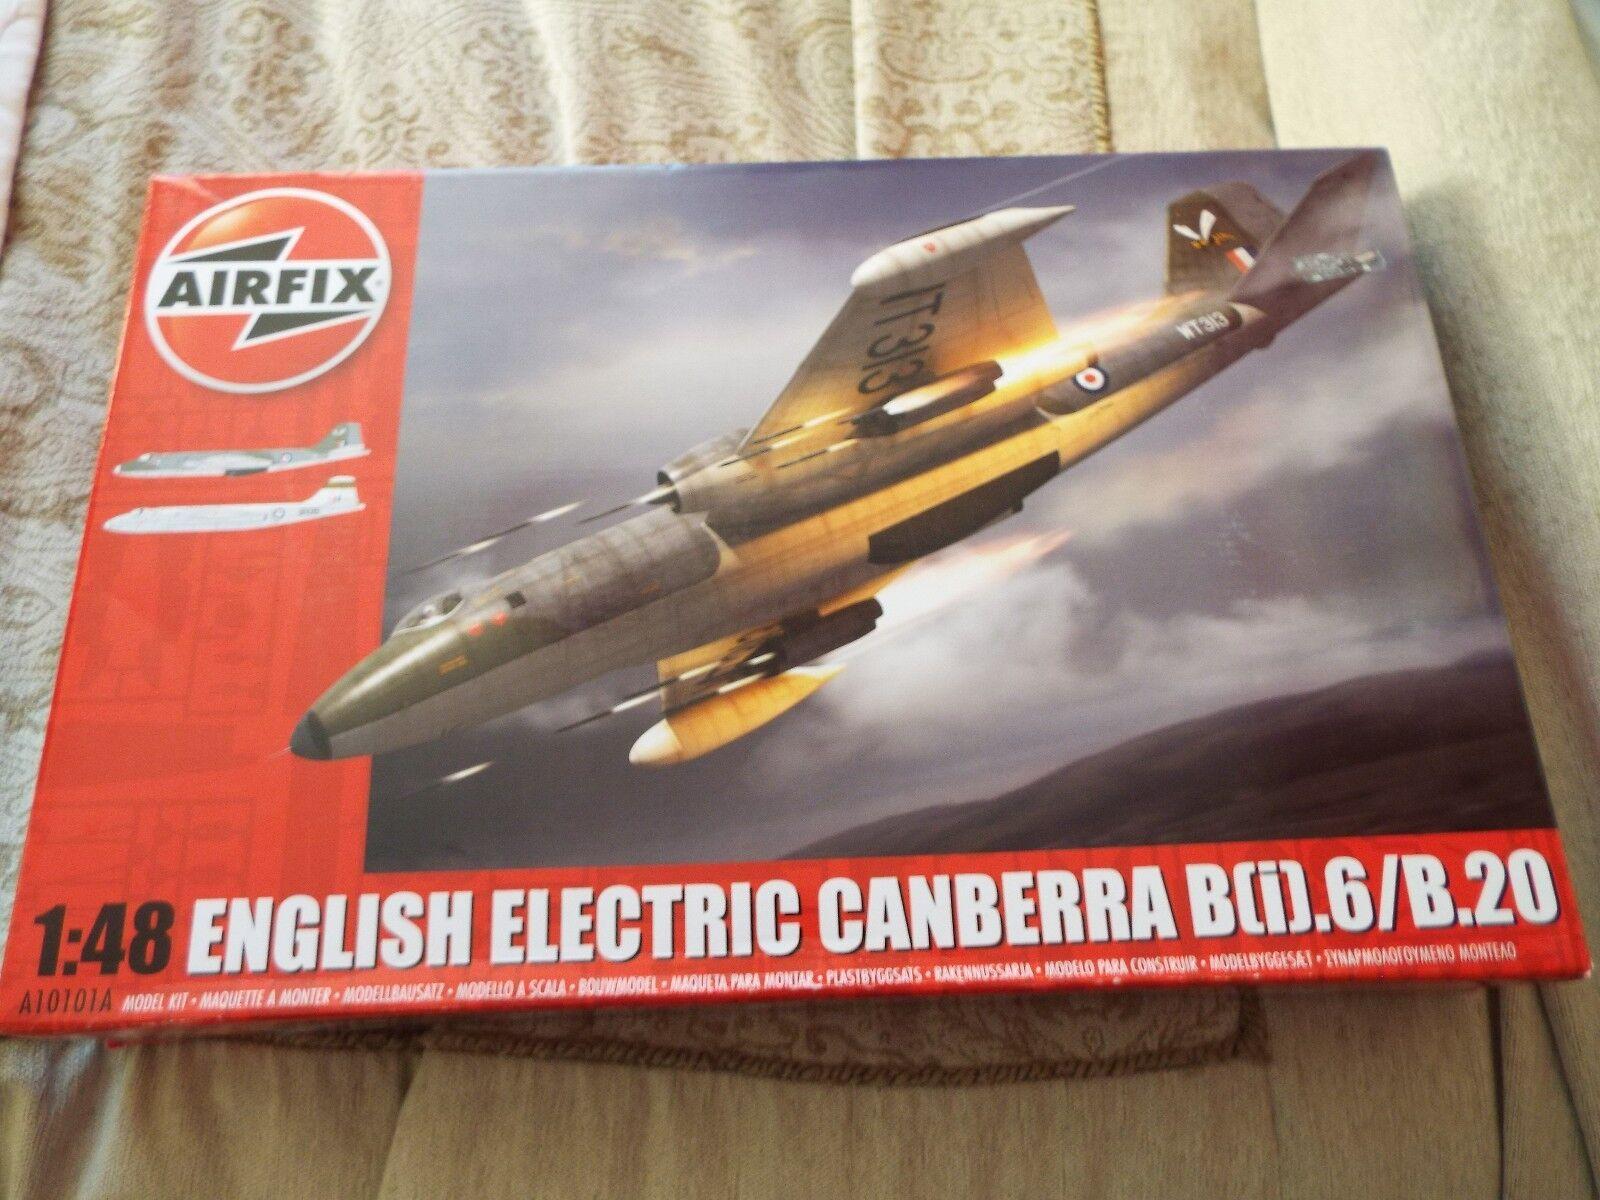 New 1 48 Airfix English Electric Can berry Bi.6 B.20